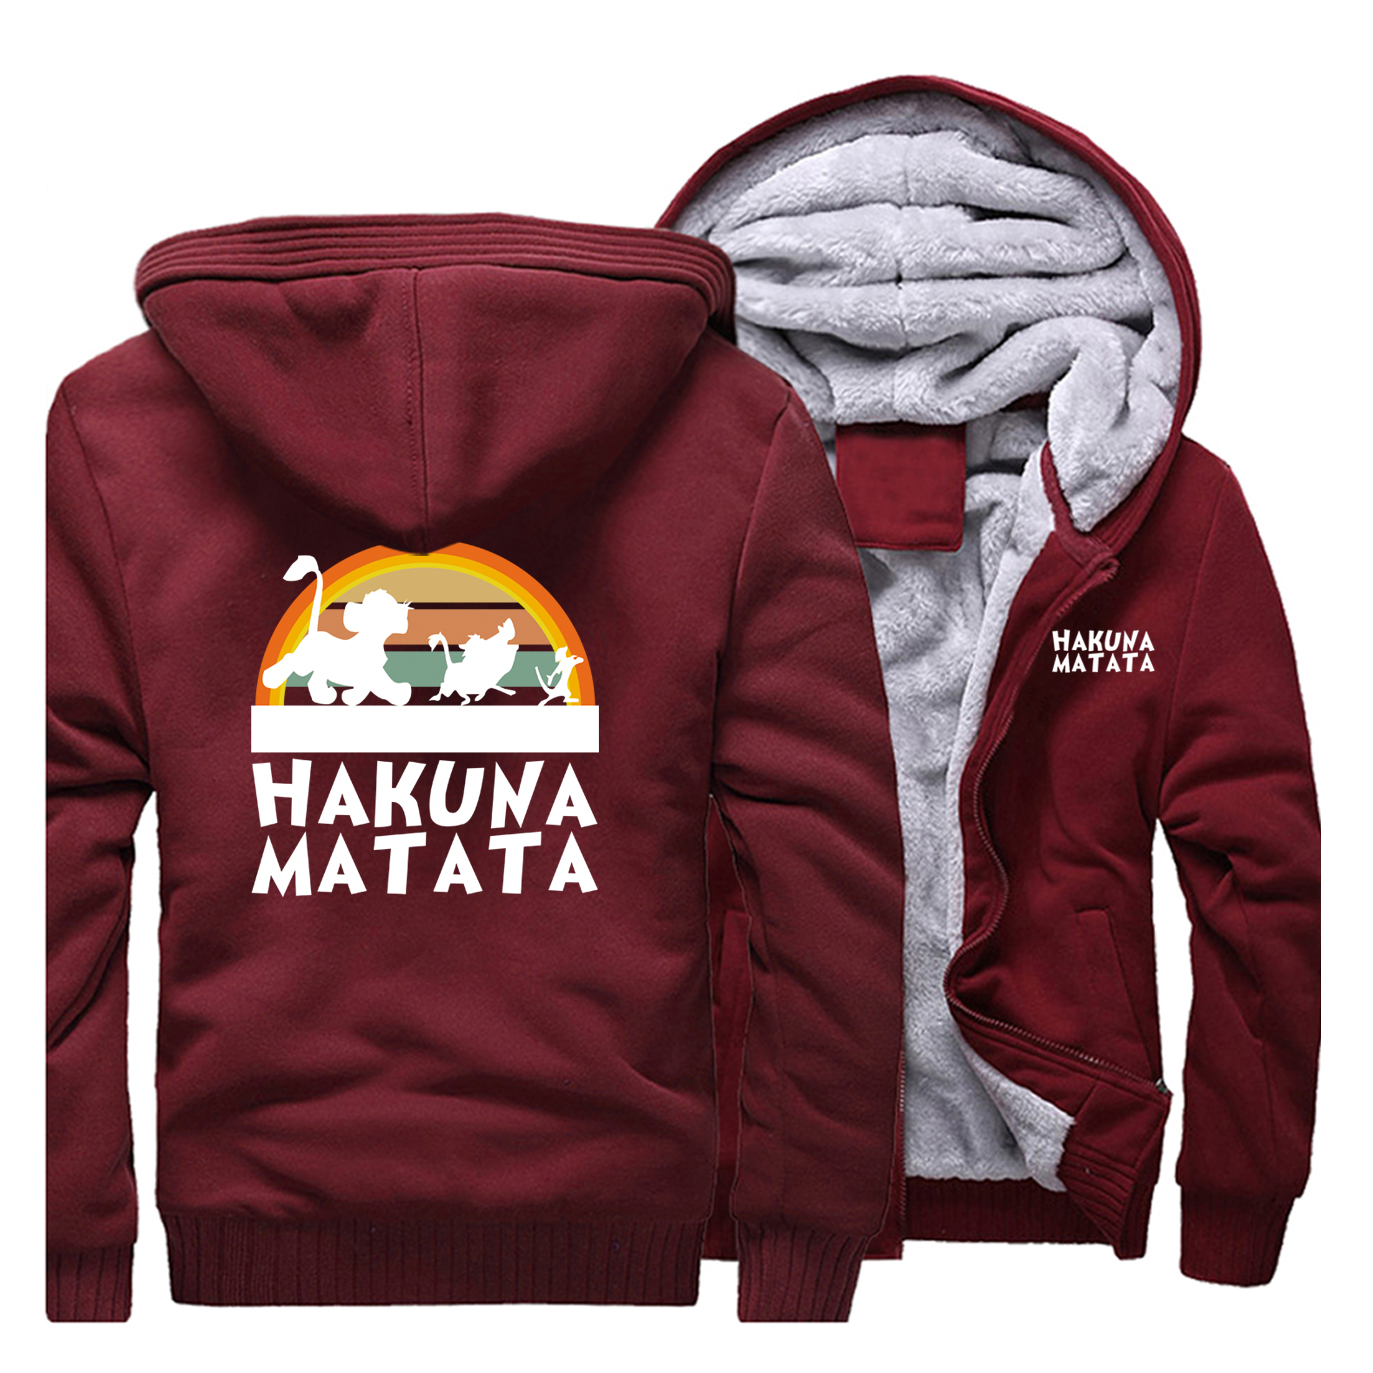 Plus Velvet Thicken Hakuna Matata Jackets Men Raglan Hoodie Trend Sweatshirt 2019 Fall Winter Warm Handsome Clothes Tracksuits